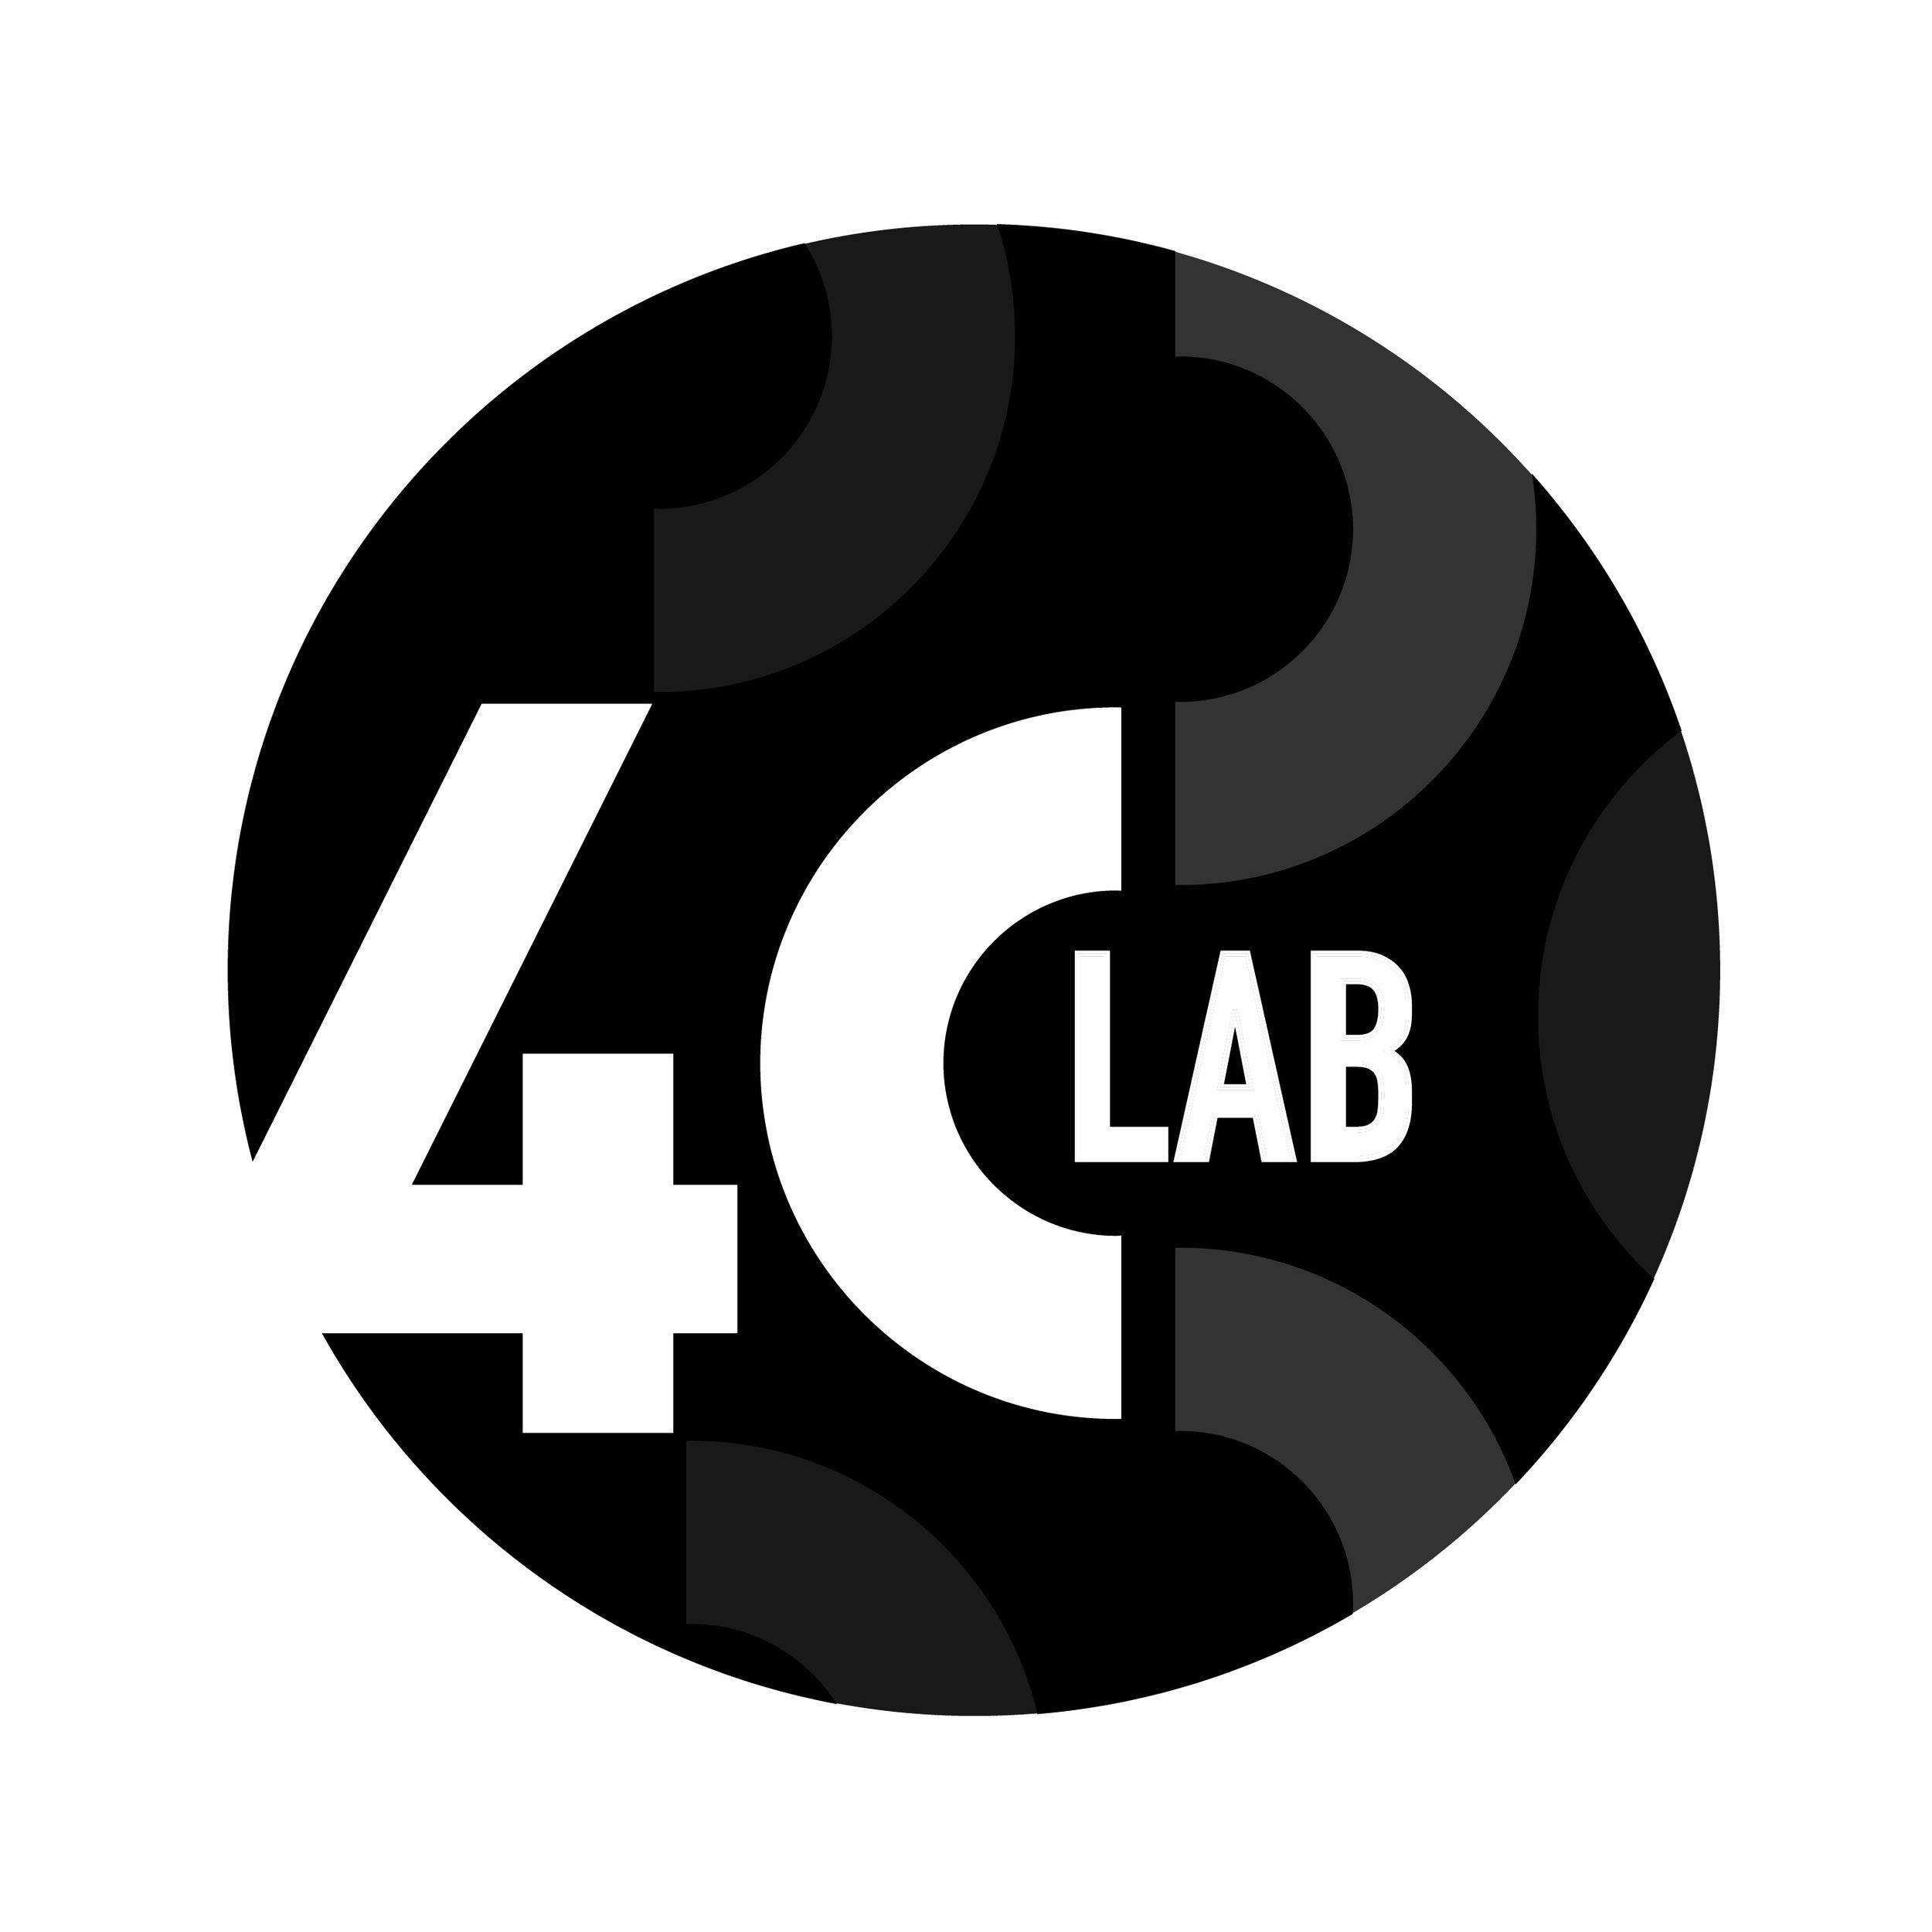 4CLAB_logo_final_v2-01.jpg